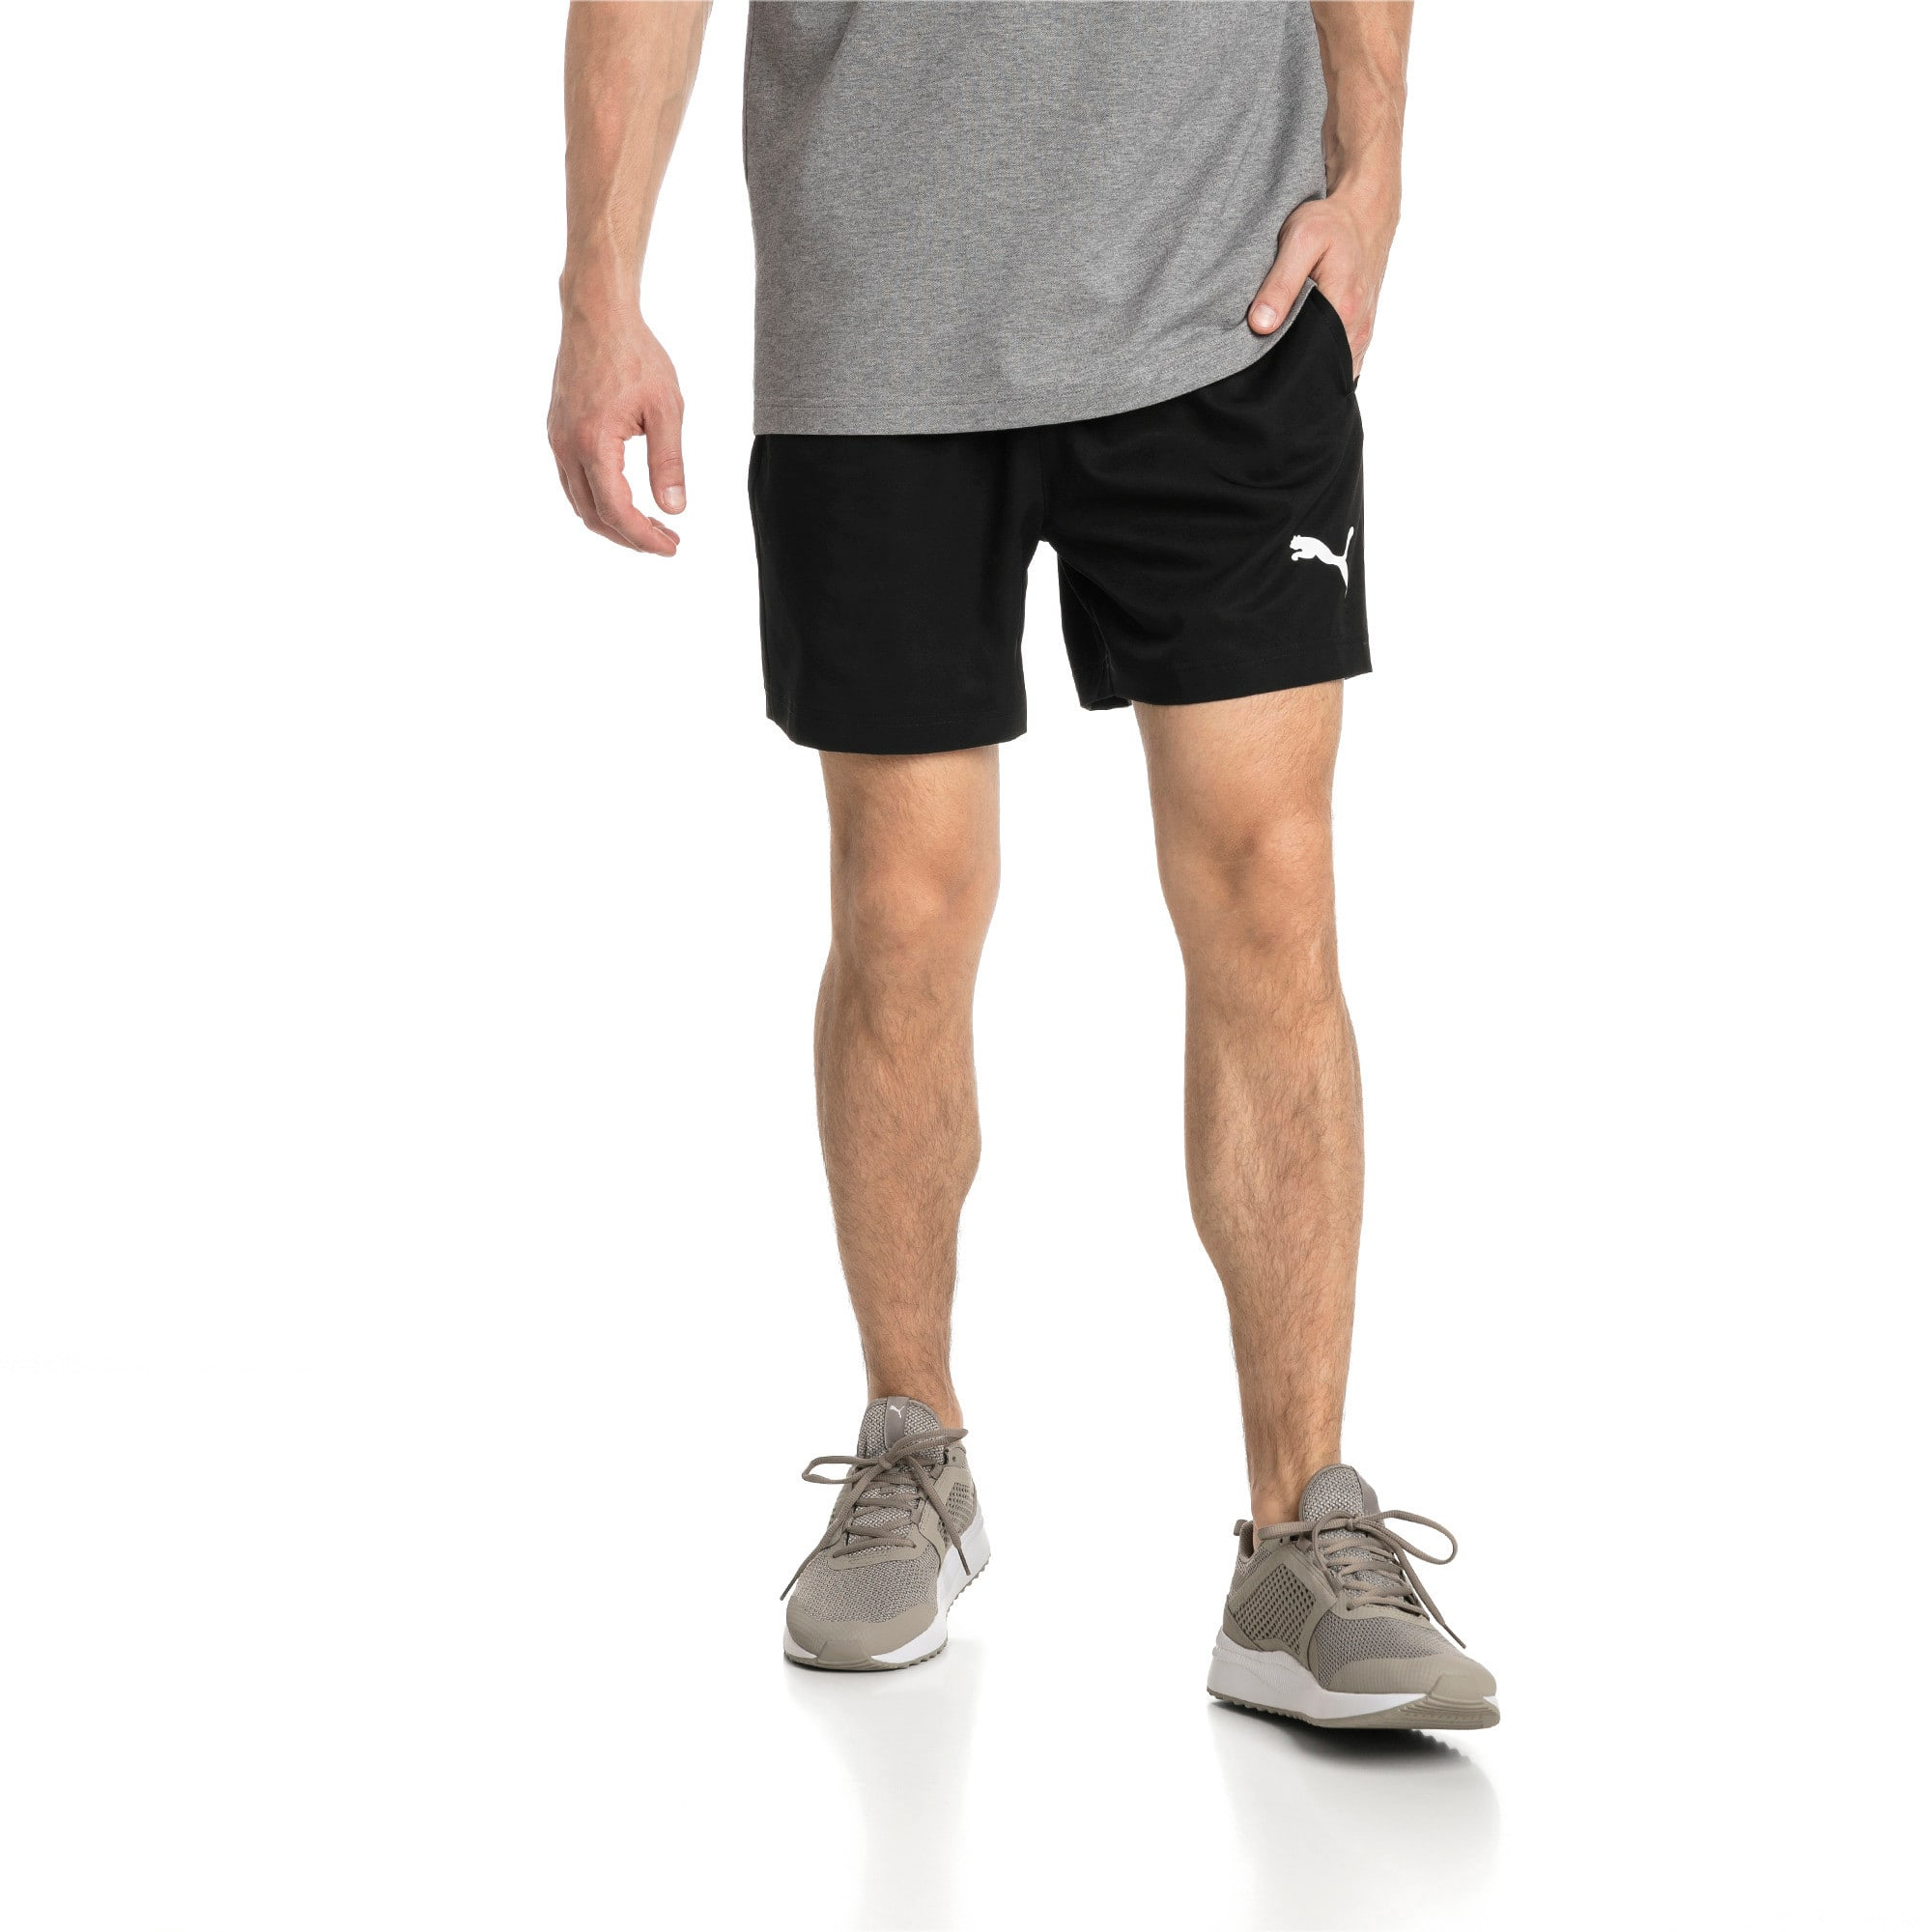 "Thumbnail 1 of Active Woven 5"" Men's Training Shorts, Puma Black, medium"